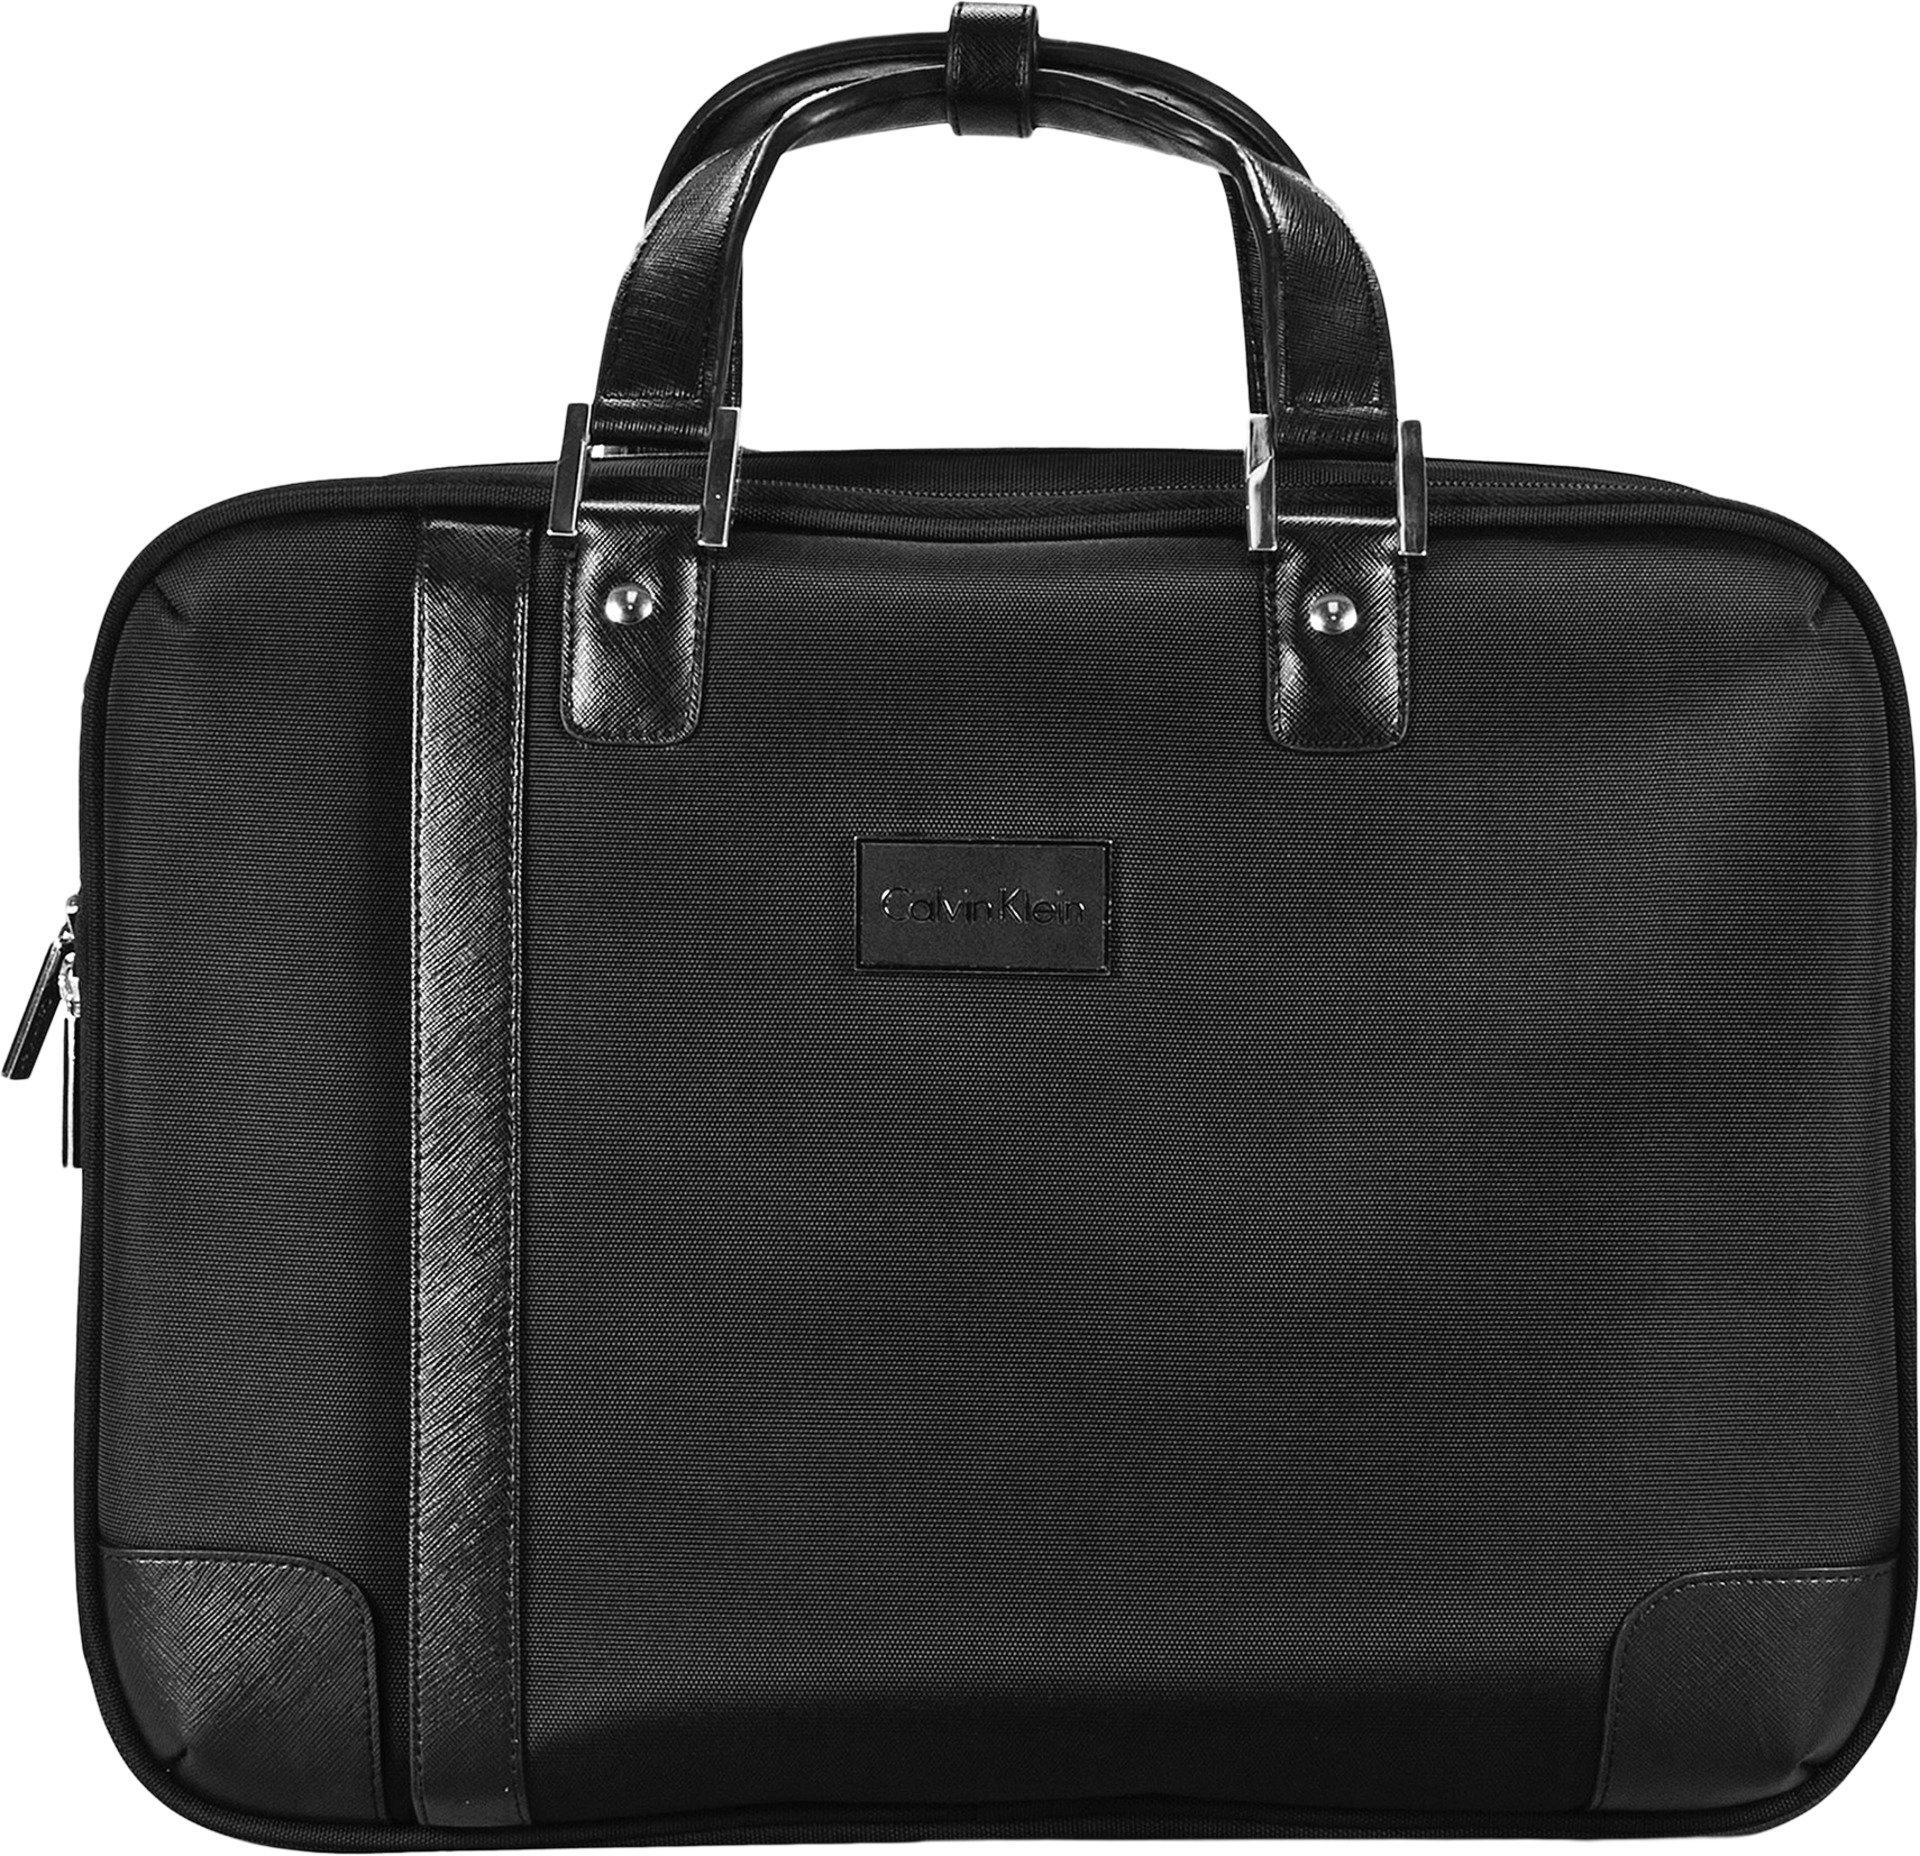 Calvin Klein Avalon 2.0 Laptop Case, Black, One Size